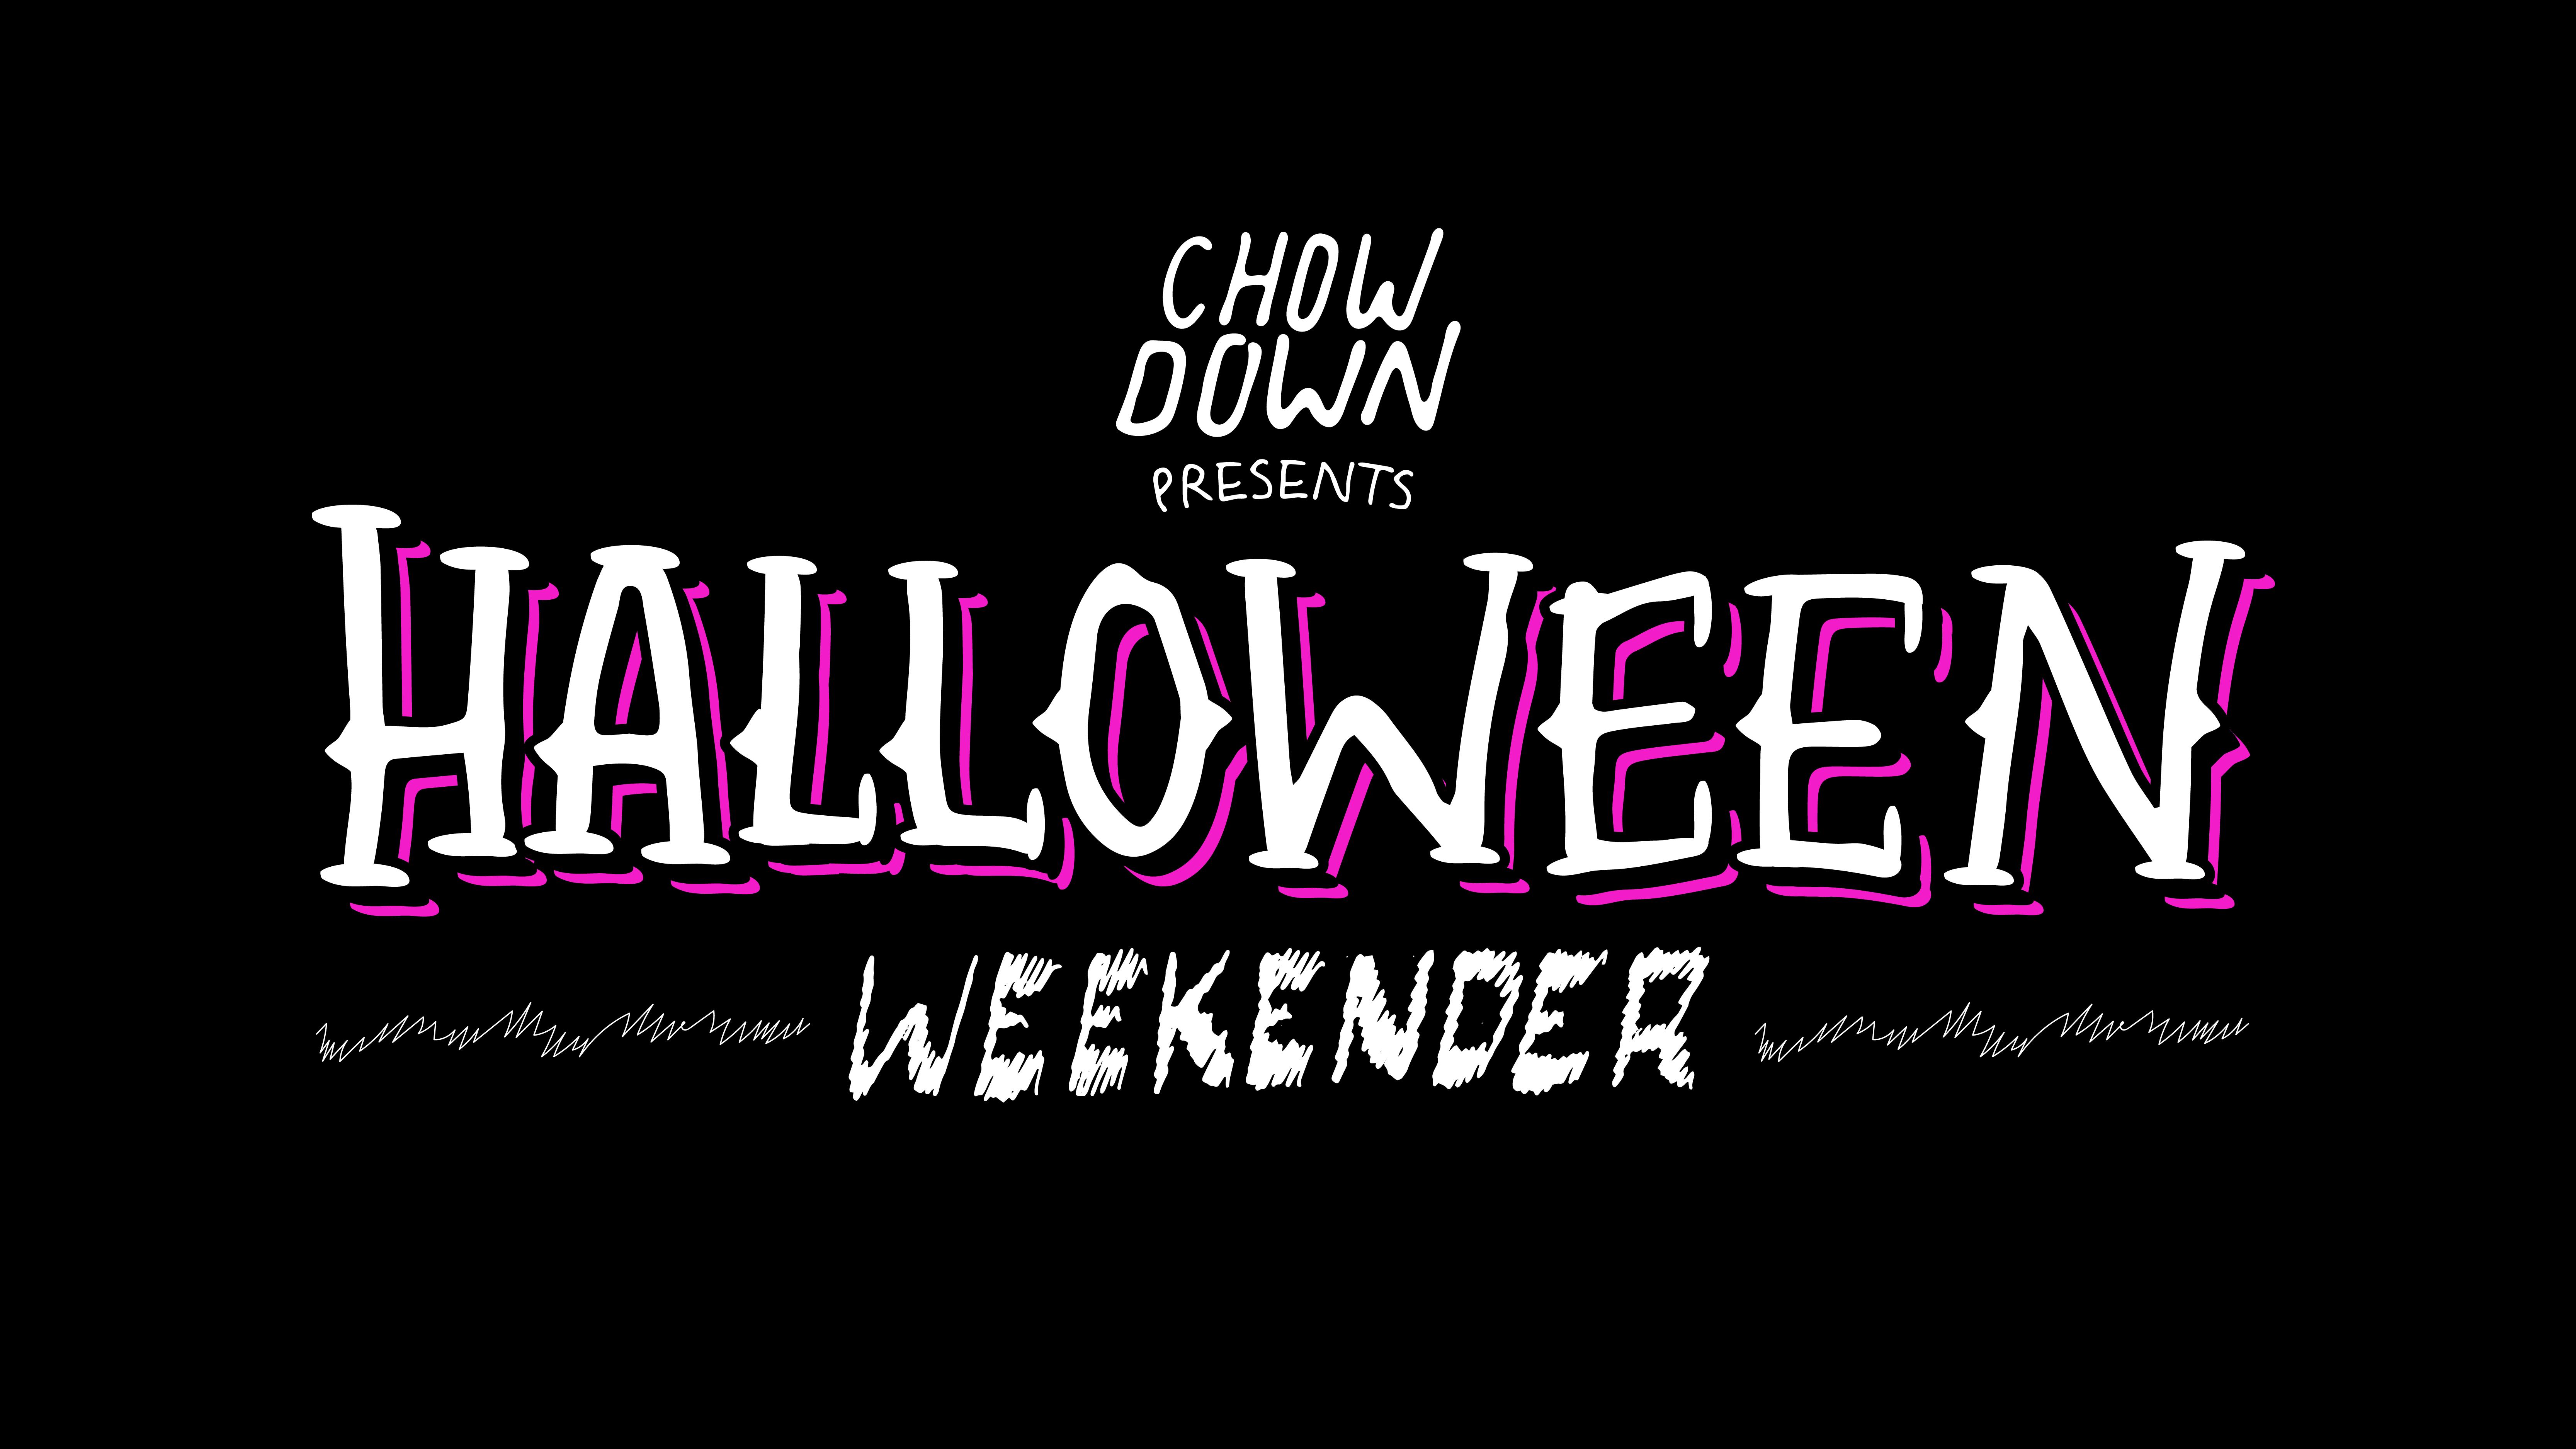 Chow Down Halloween: Sunday 31st October – Forrest Road Soundsystem (DJ Set)